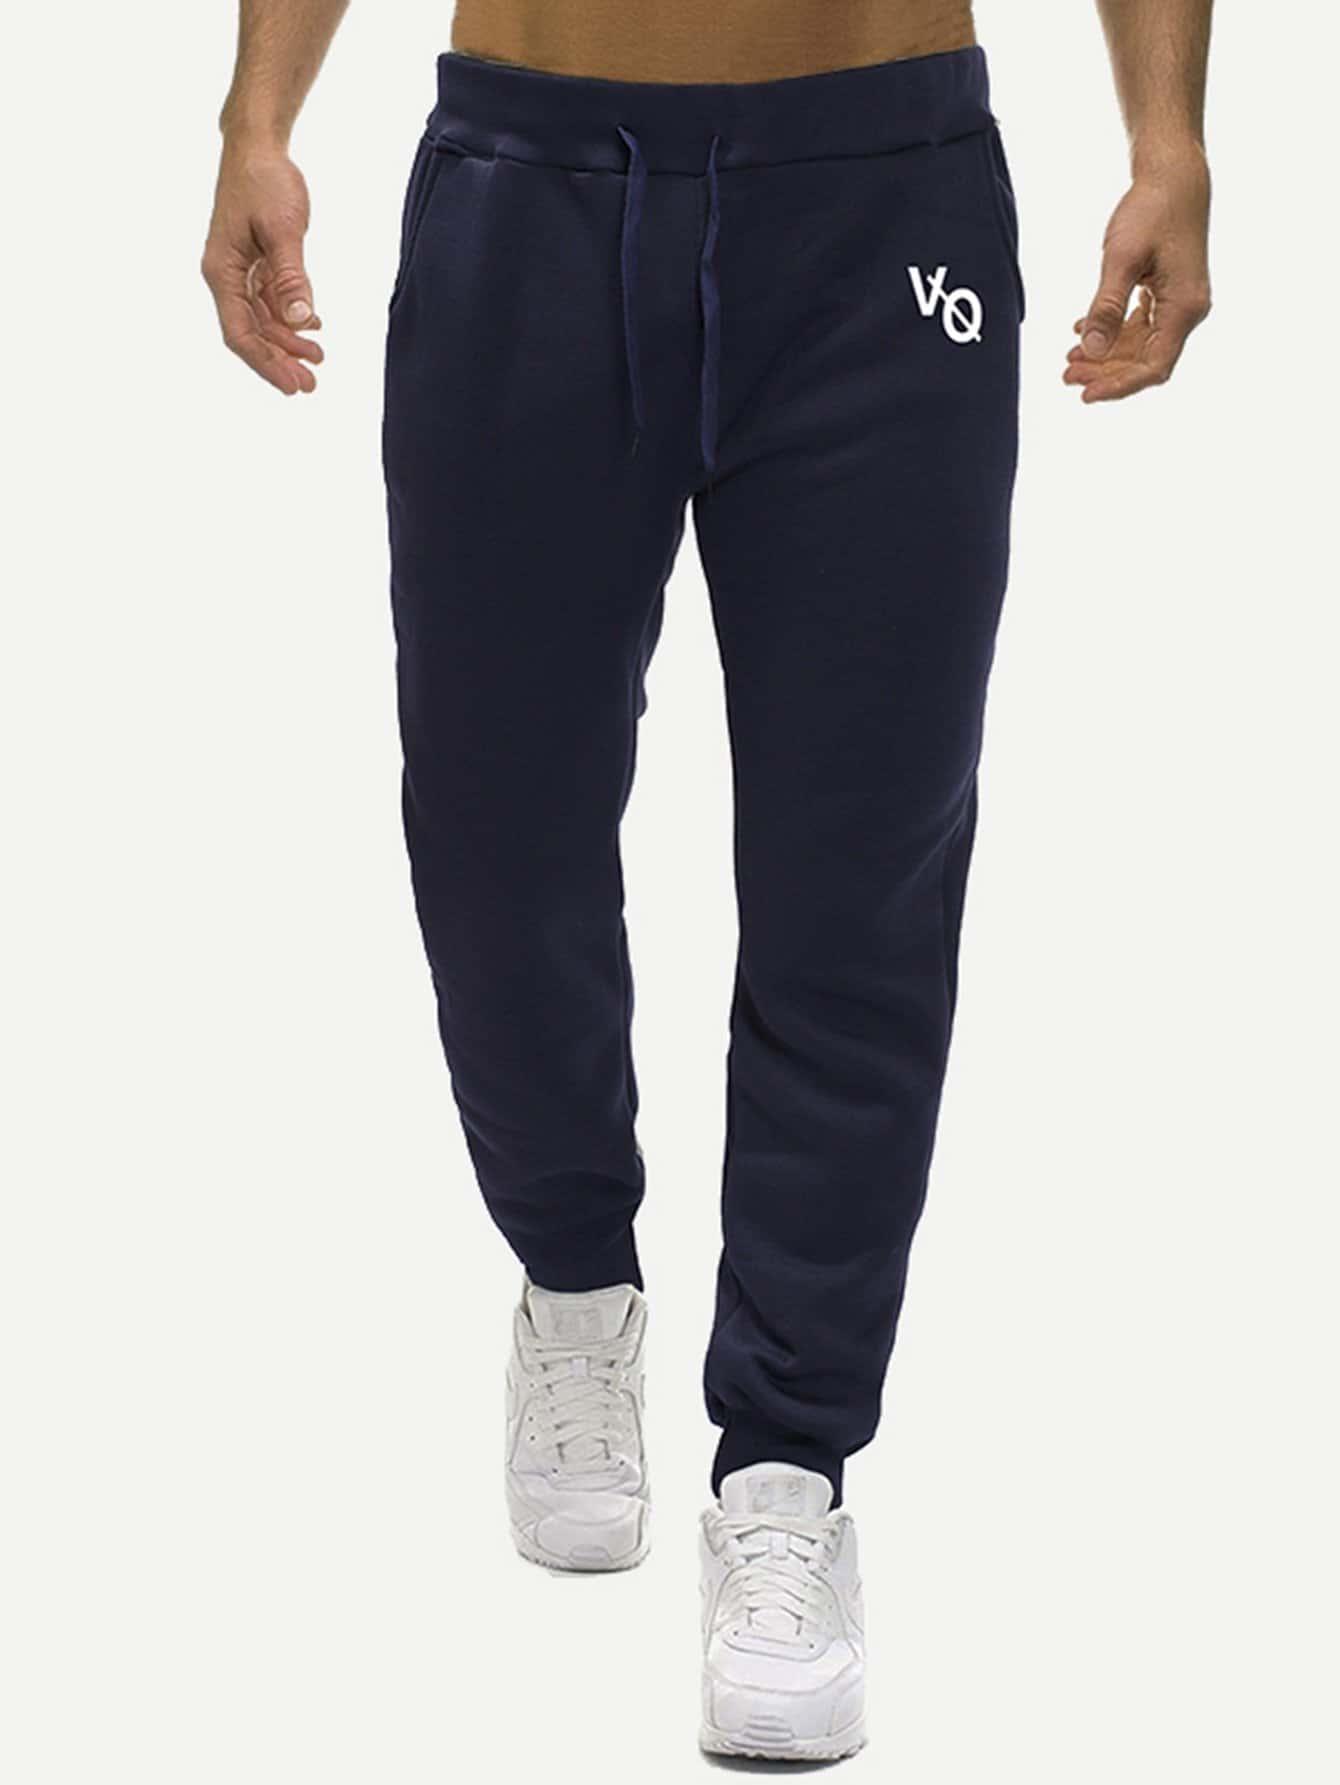 Фото - Мужские брюки с текстовым принтом от SheIn цвет темно синий